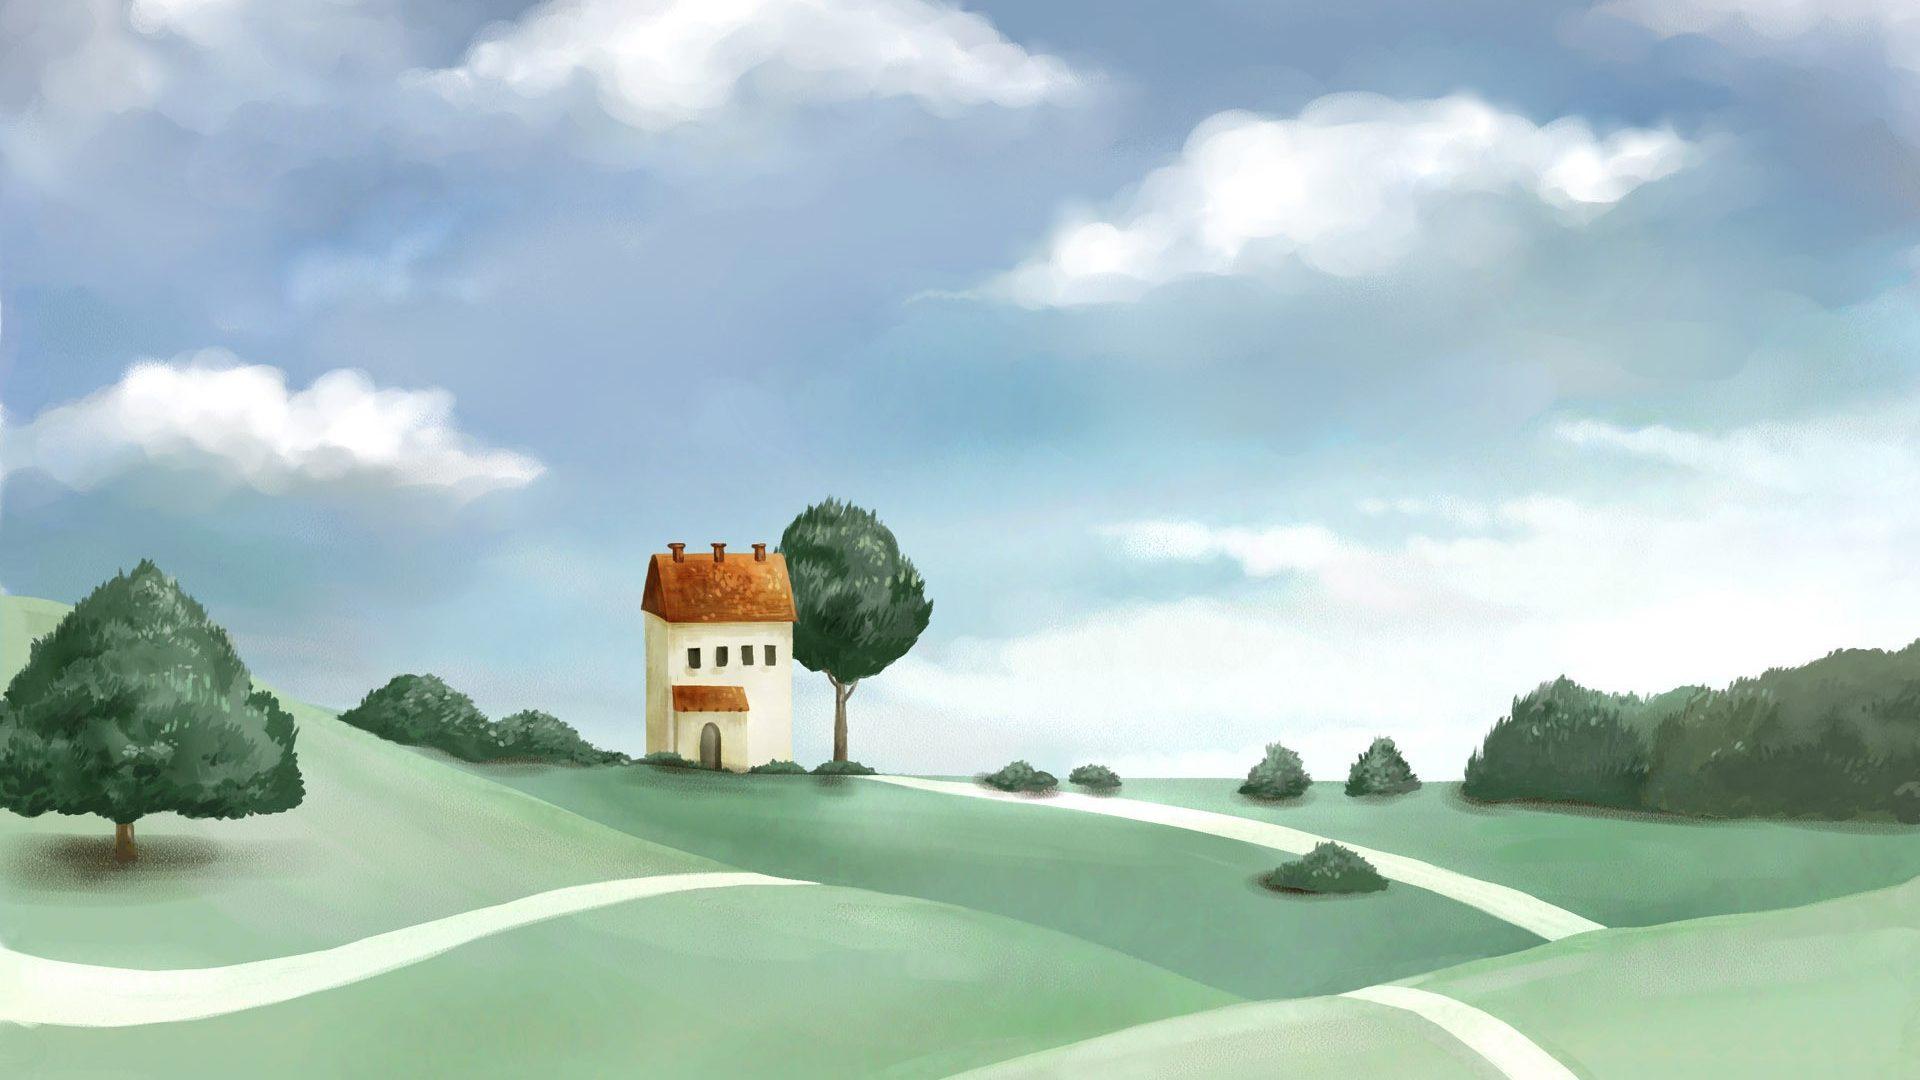 Drawn wallpaper house Art Night Drawing Cloud 16:9